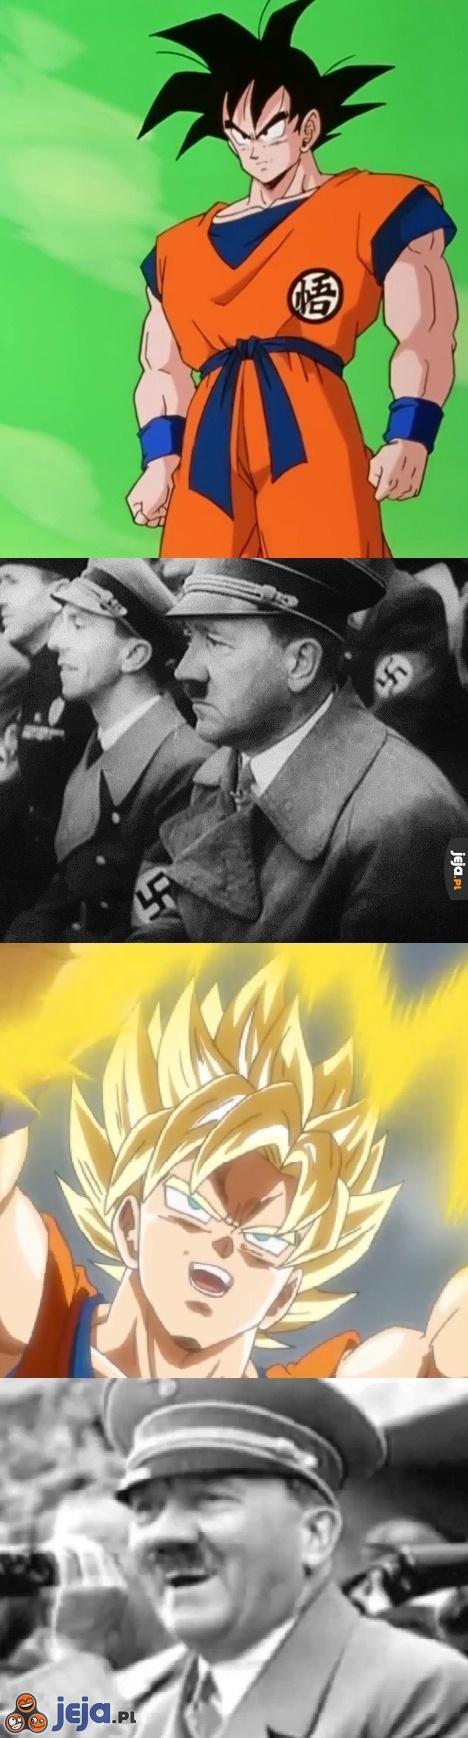 Wzór rasy aryjskiej